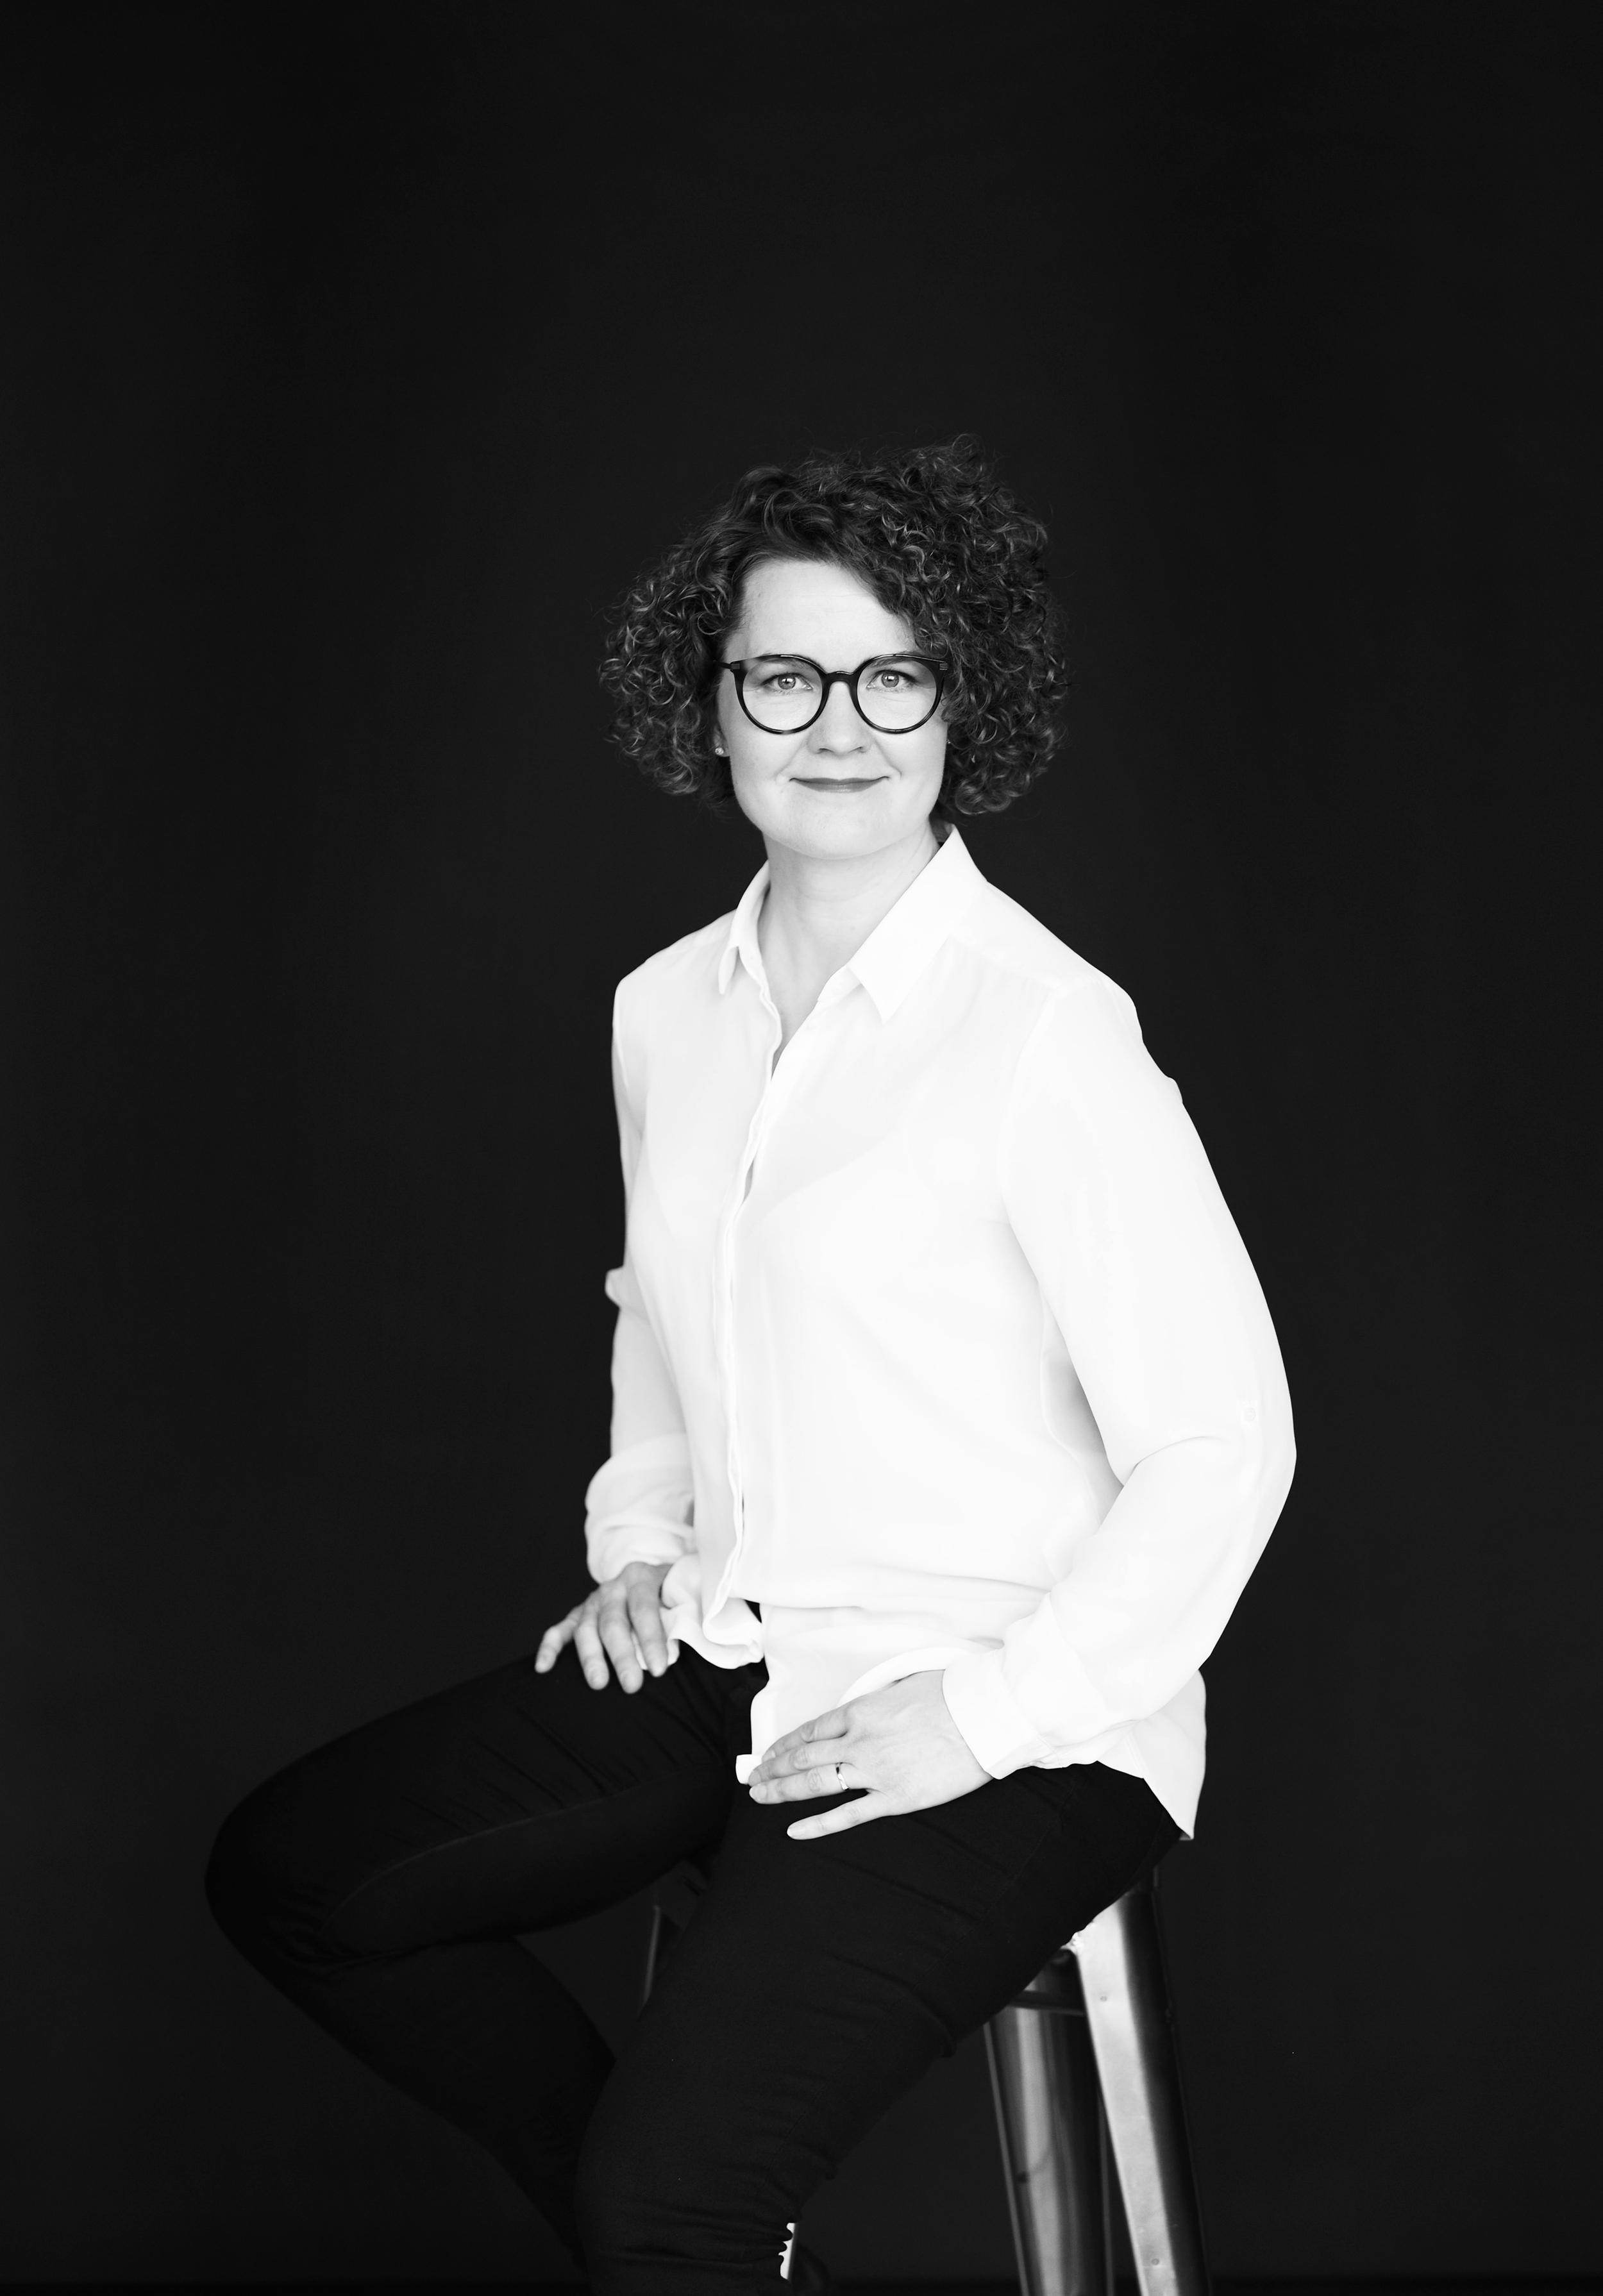 Kuva: Olga Poppius /Studio Fotonokka